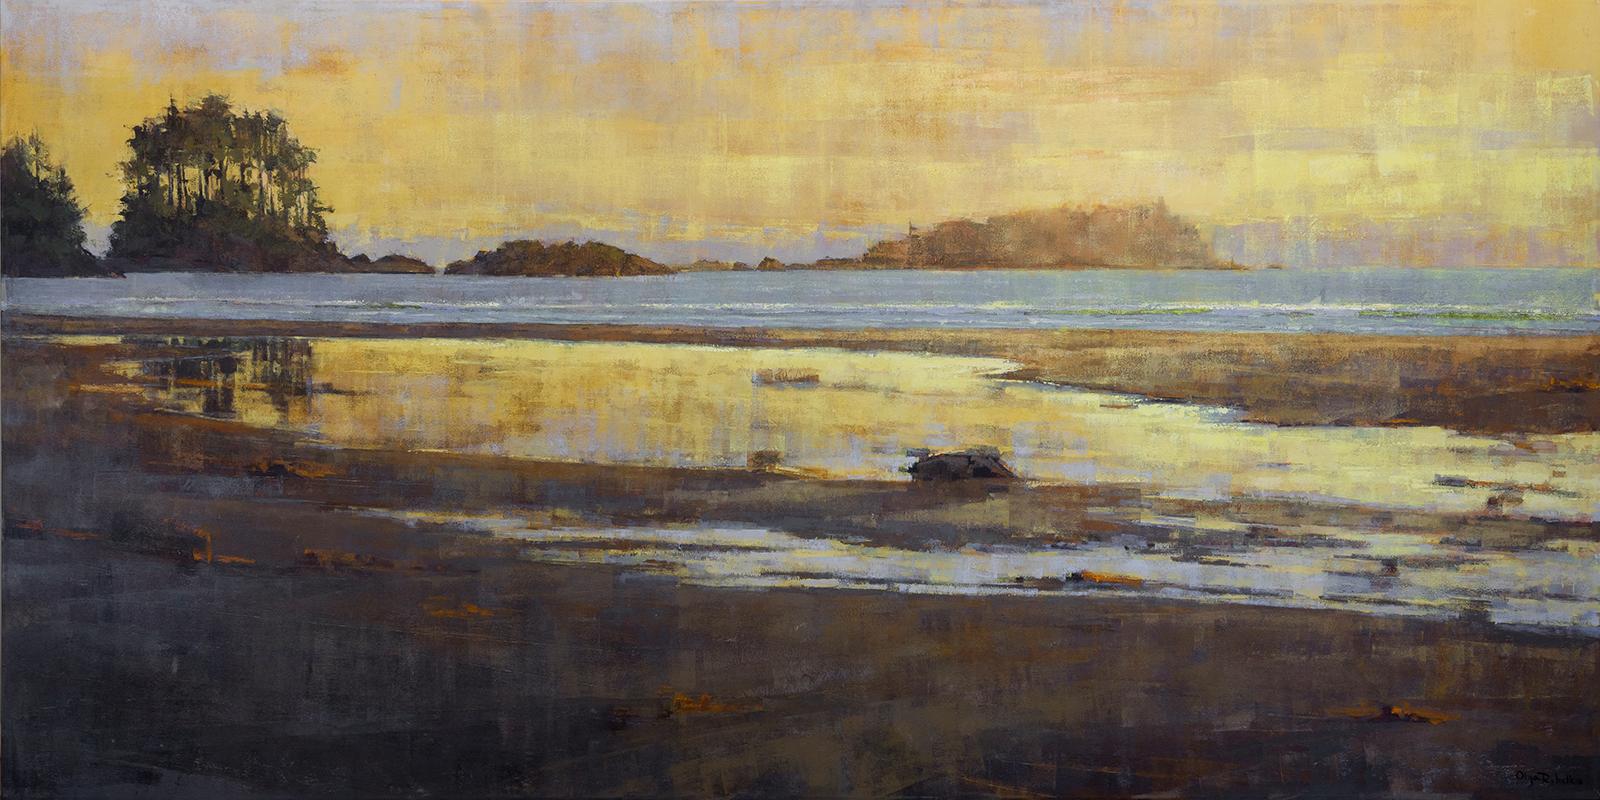 olga rybalko art - pacific rim - landscape painting-8.jpg